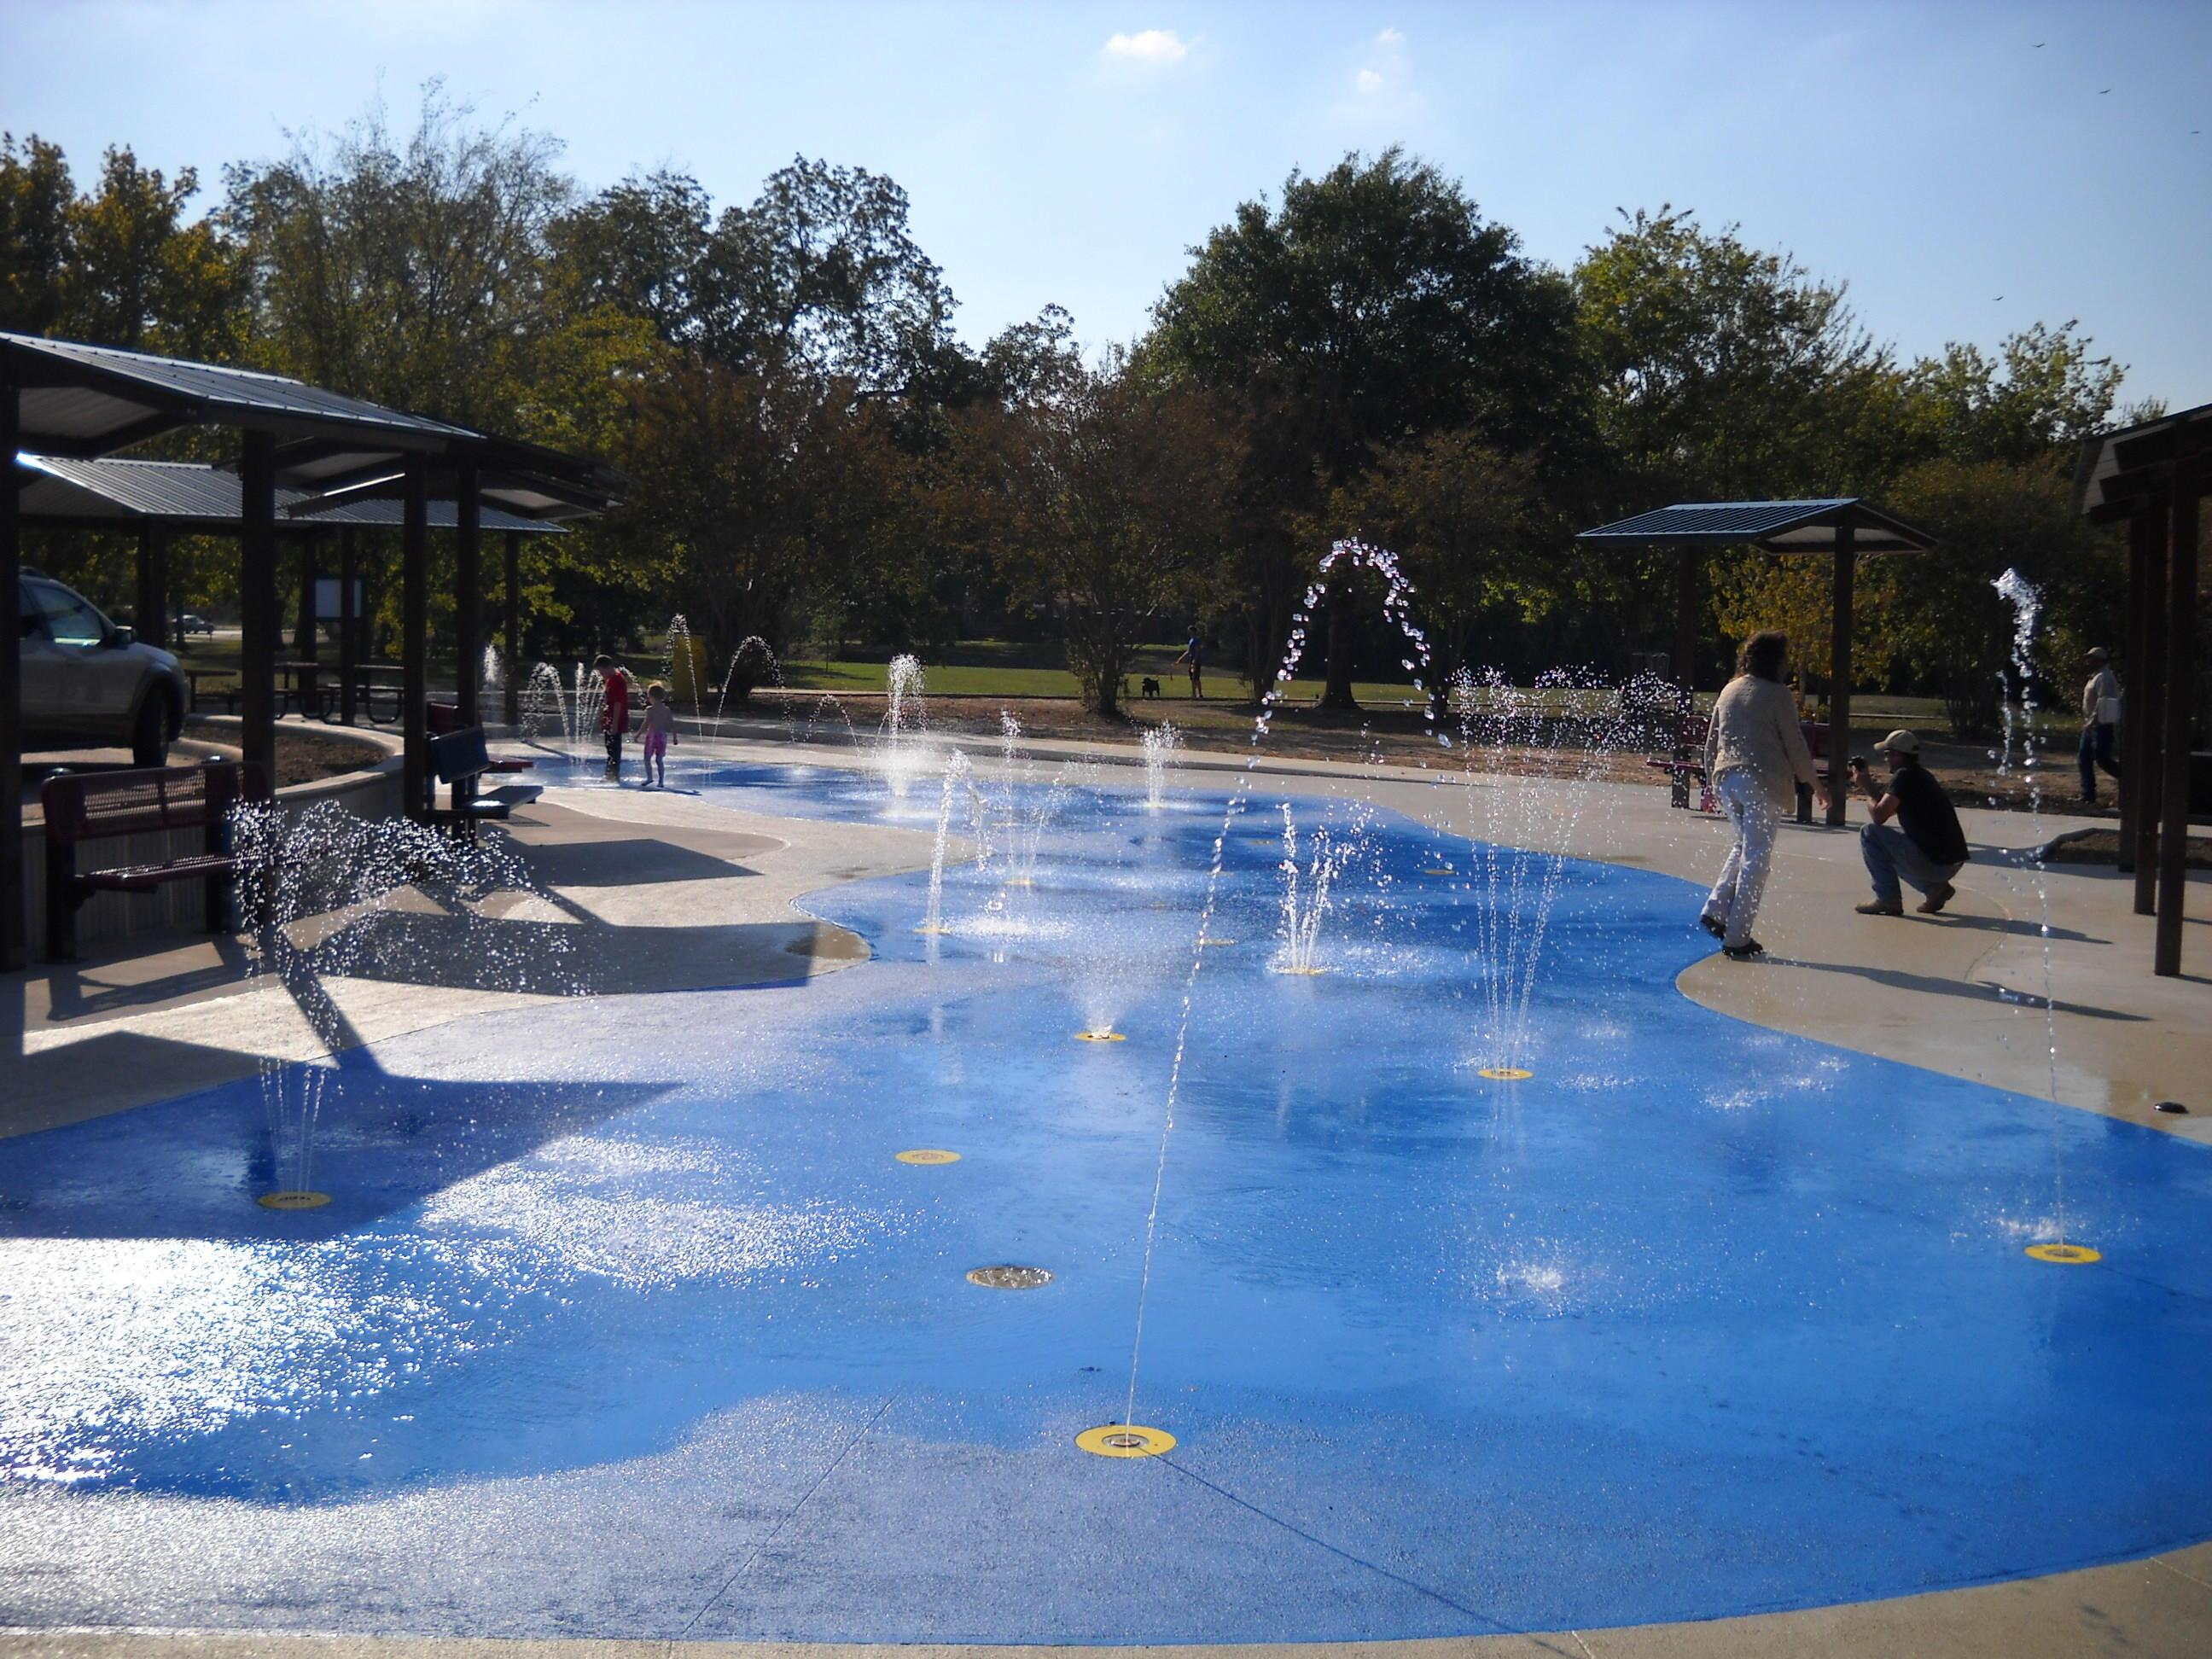 Adventure Playground Systems image 3